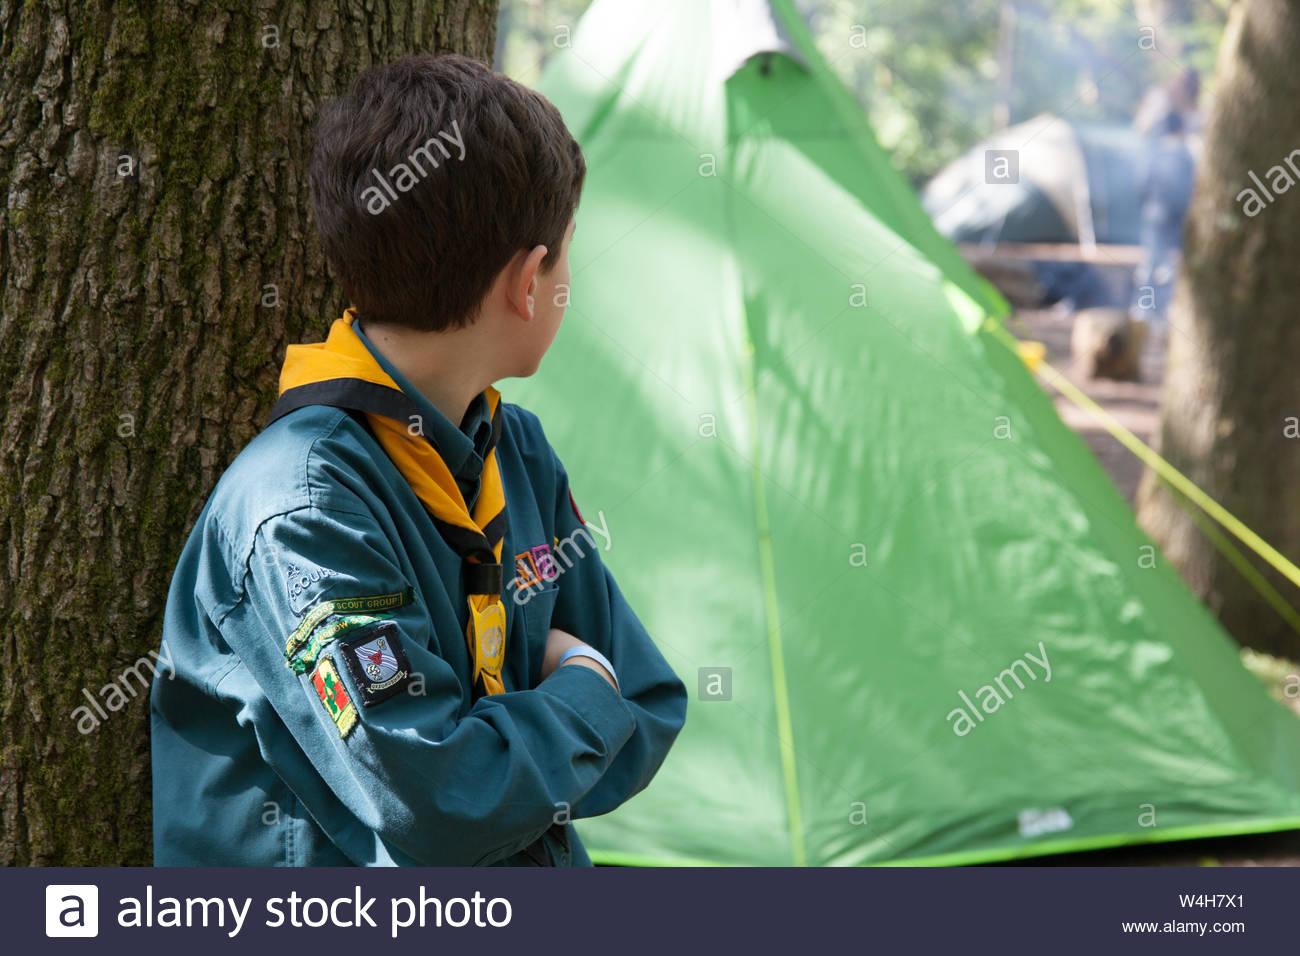 Boy Scout Uk Stock Photos & Boy Scout Uk Stock Images - Alamy